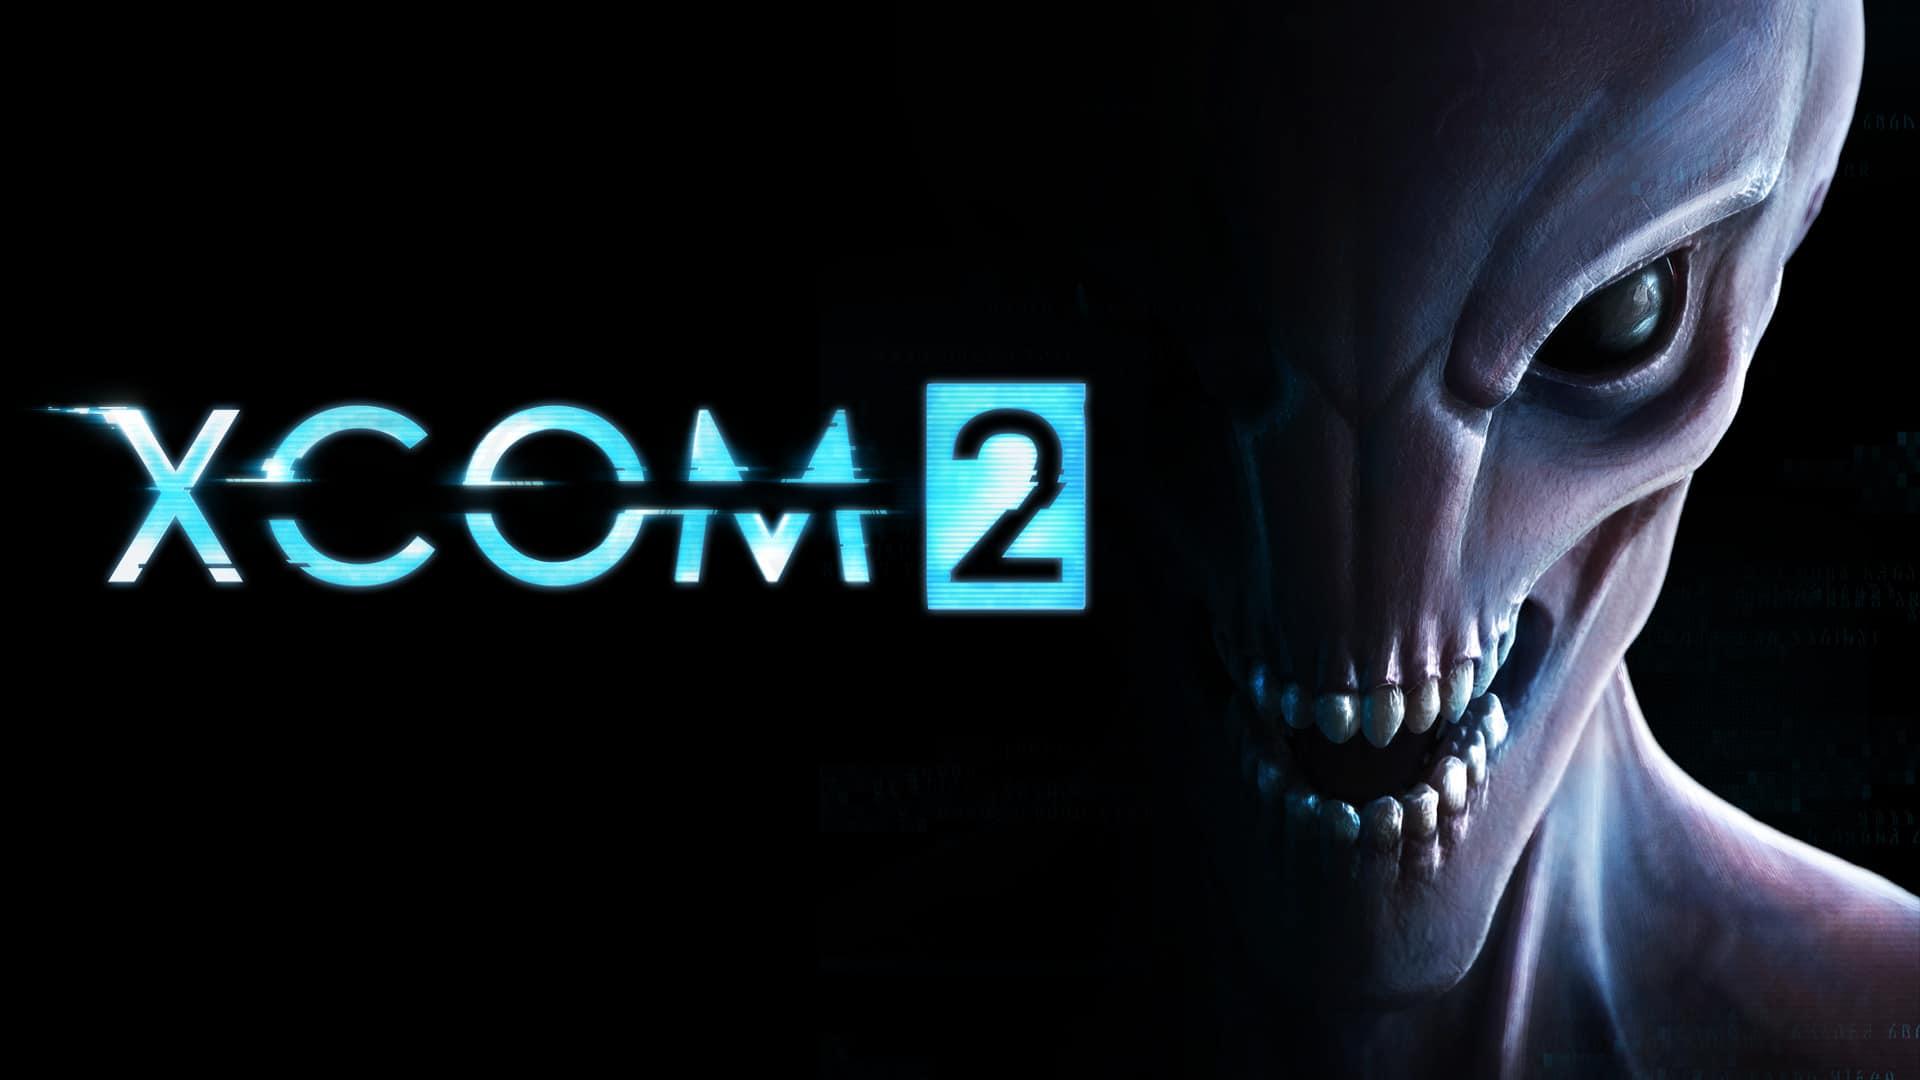 XCOM 2 immagine in evidenza